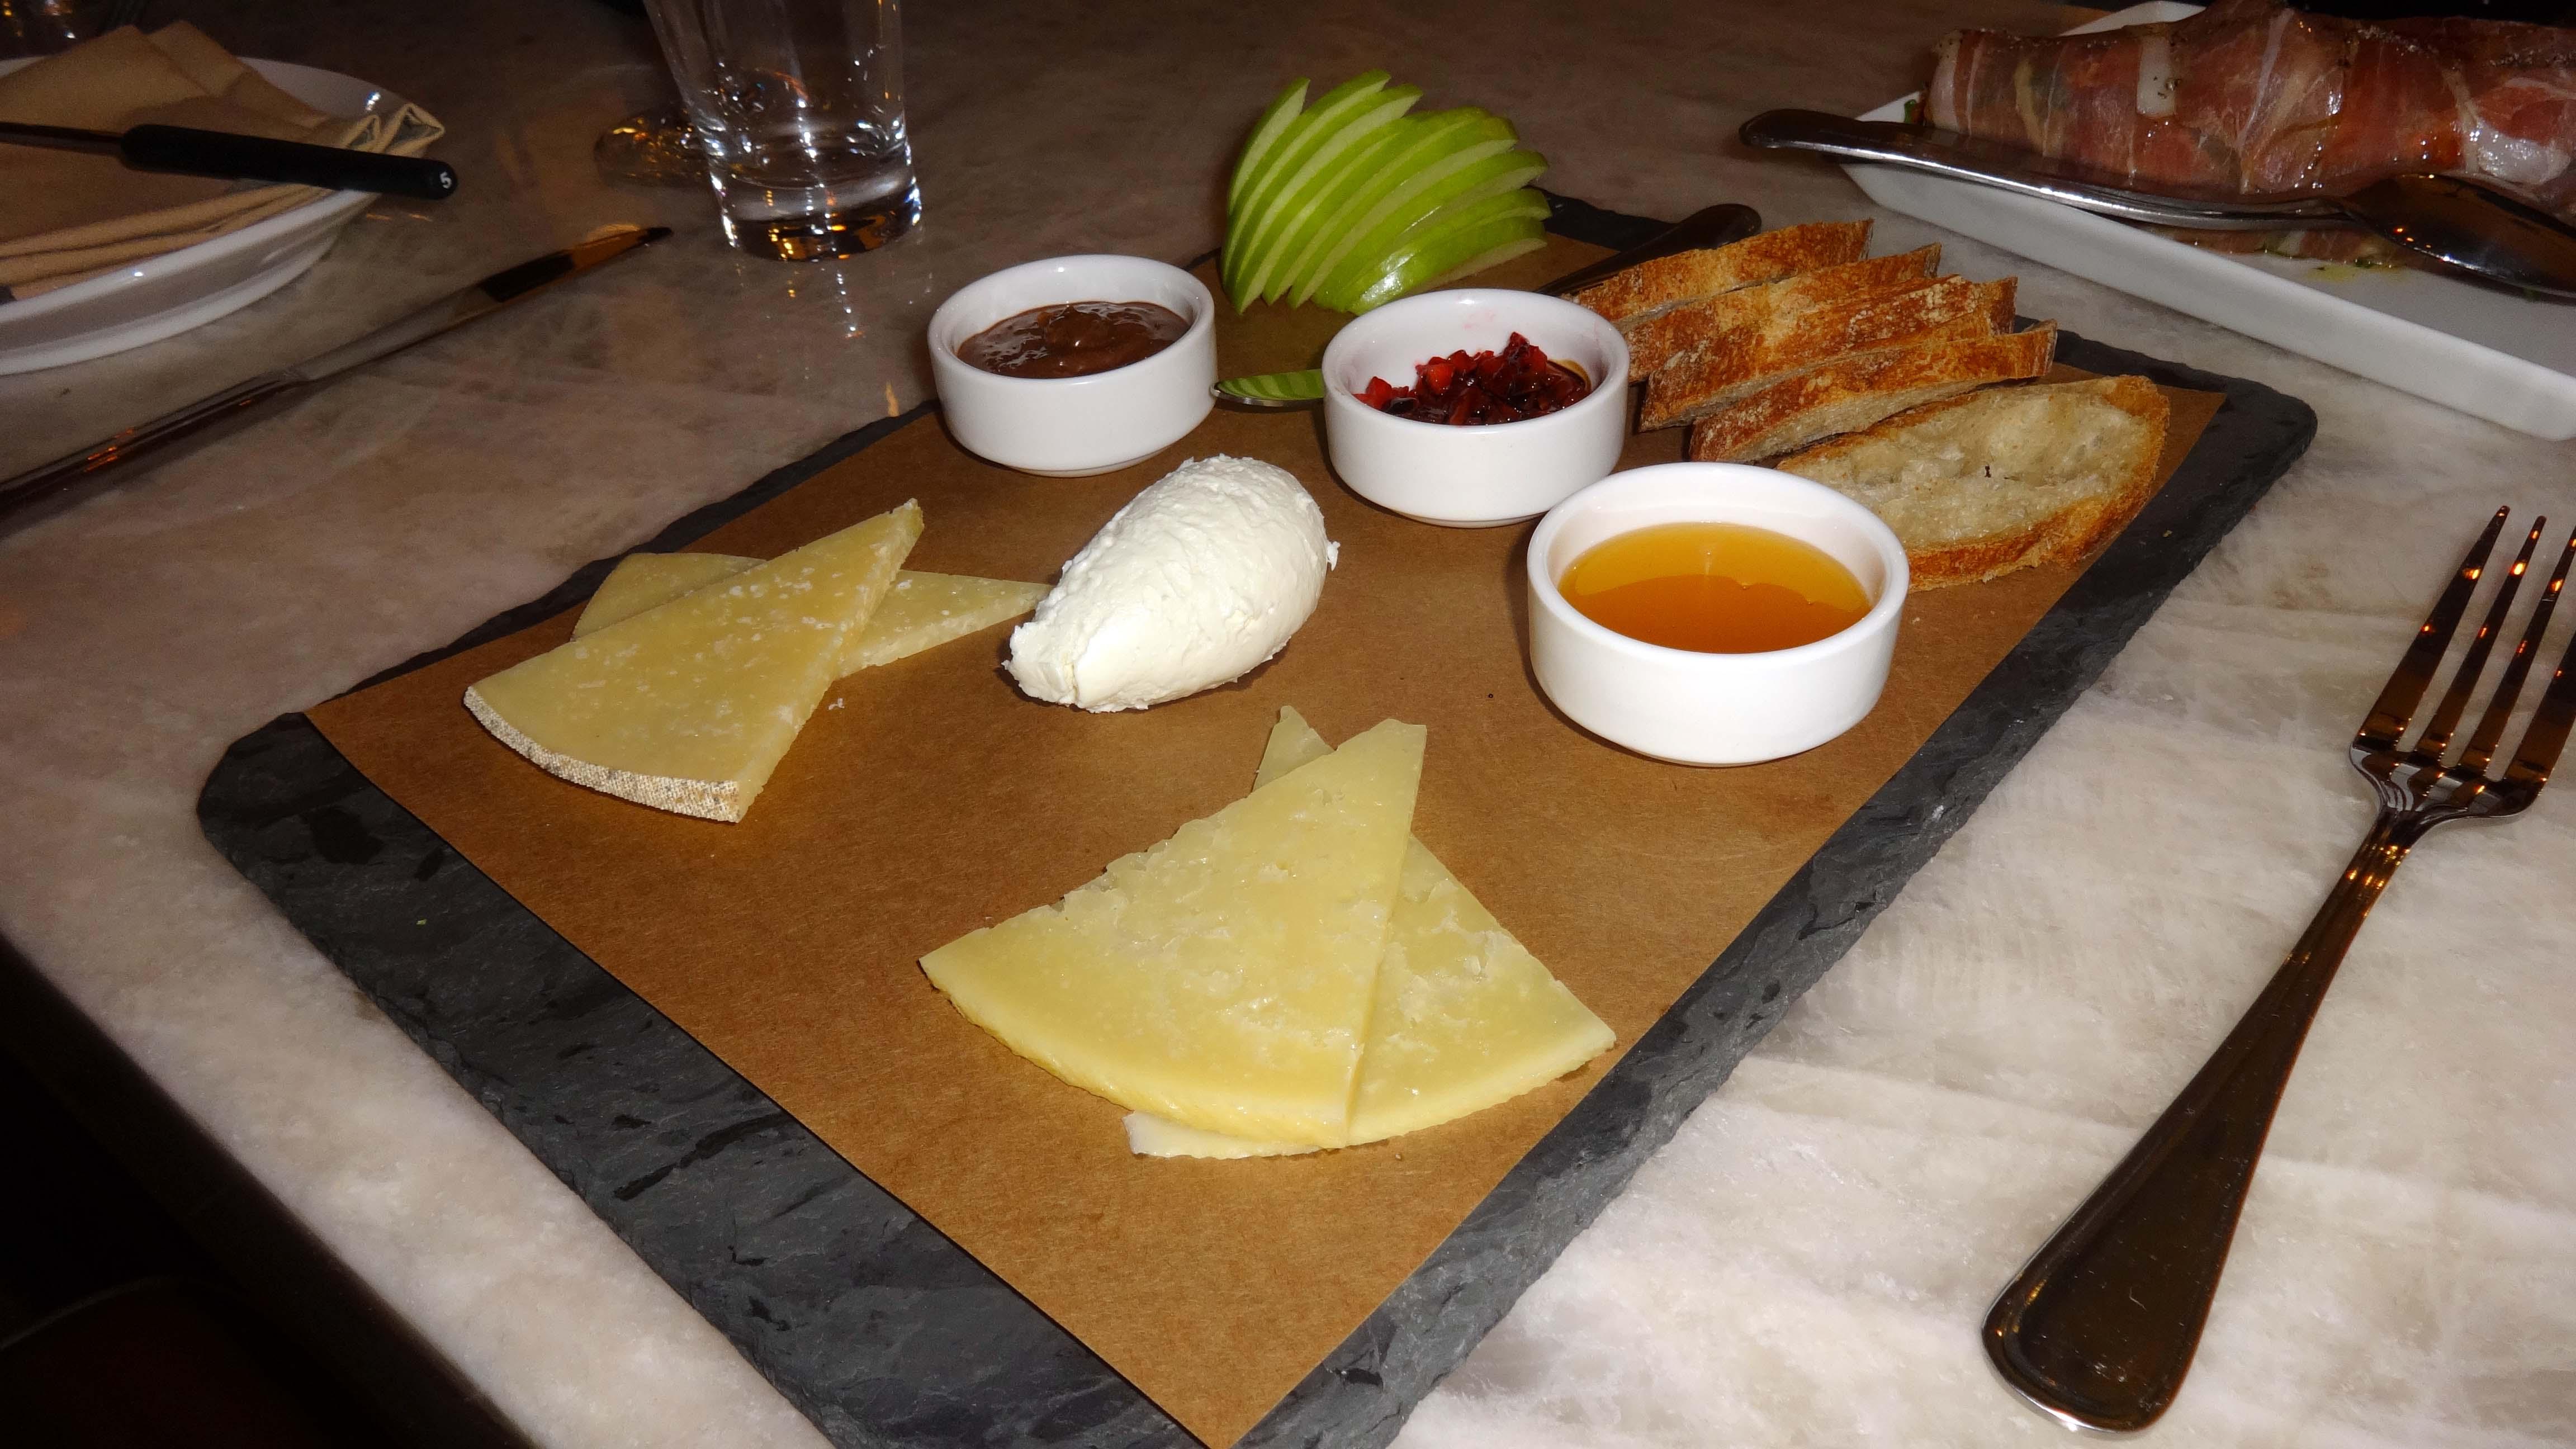 Amada cheese plate